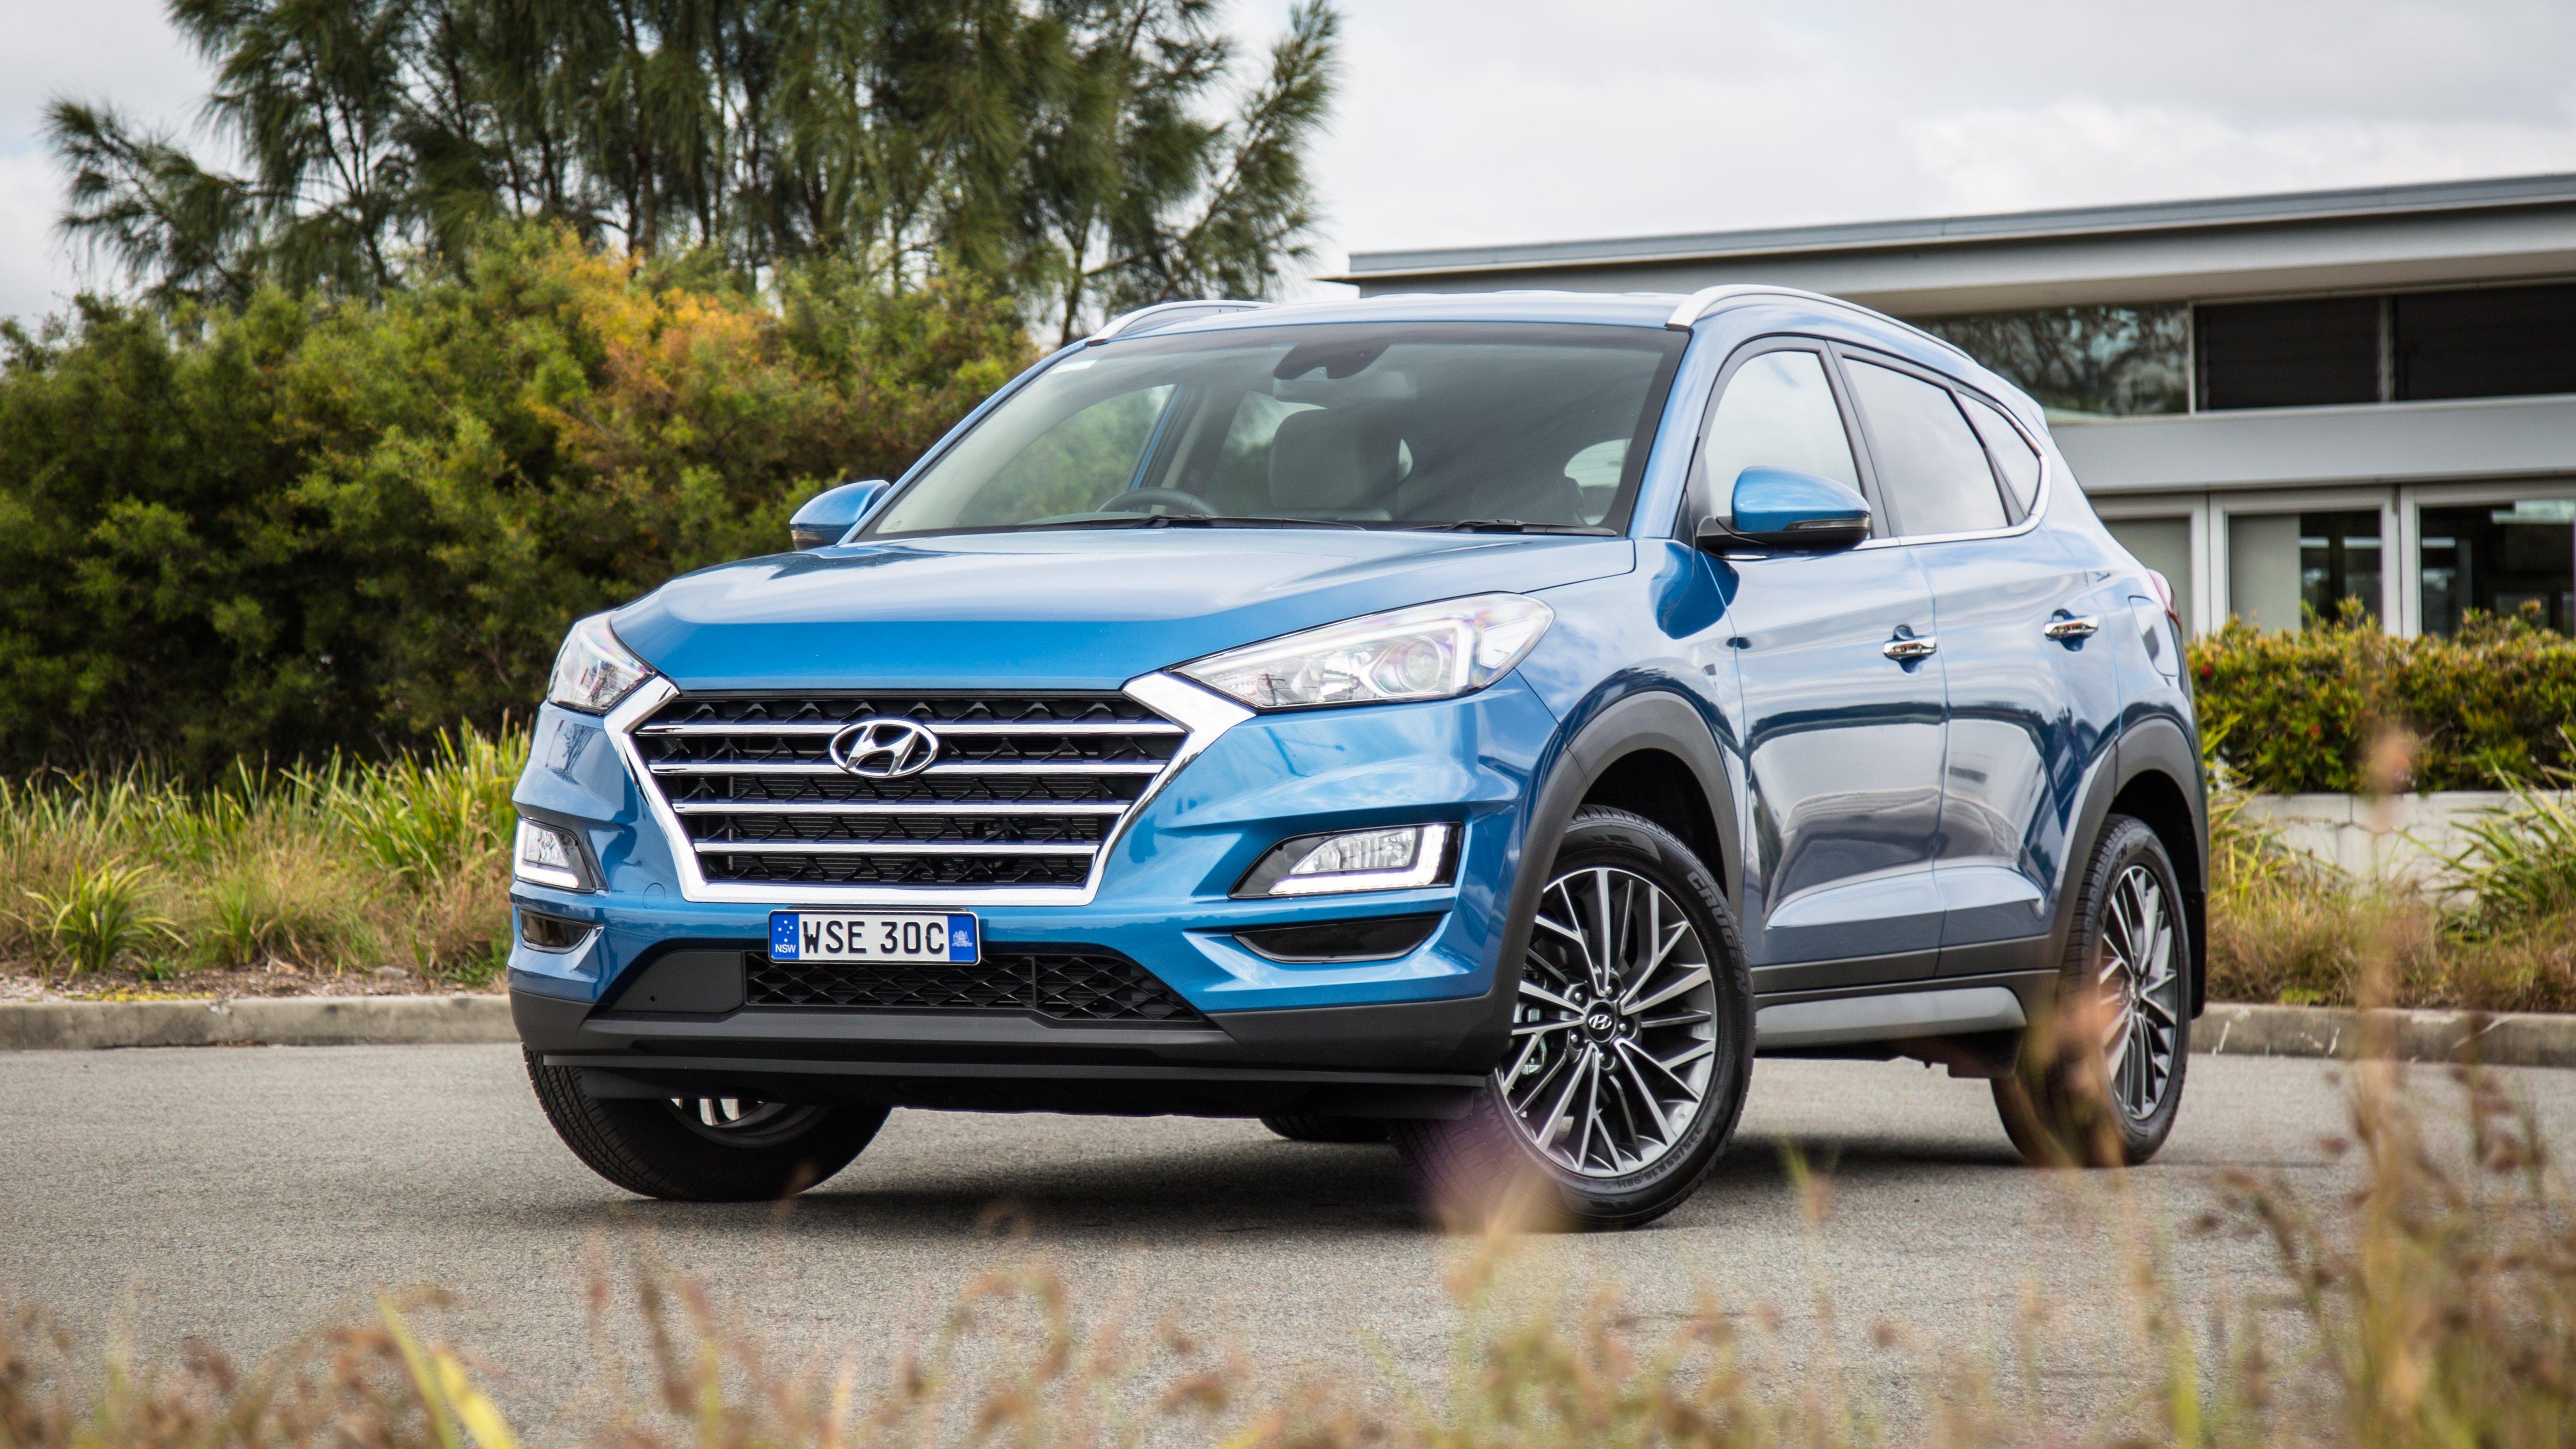 2019 Hyundai Tucson Elite 2 0 GDi 2WD review | CarAdvice